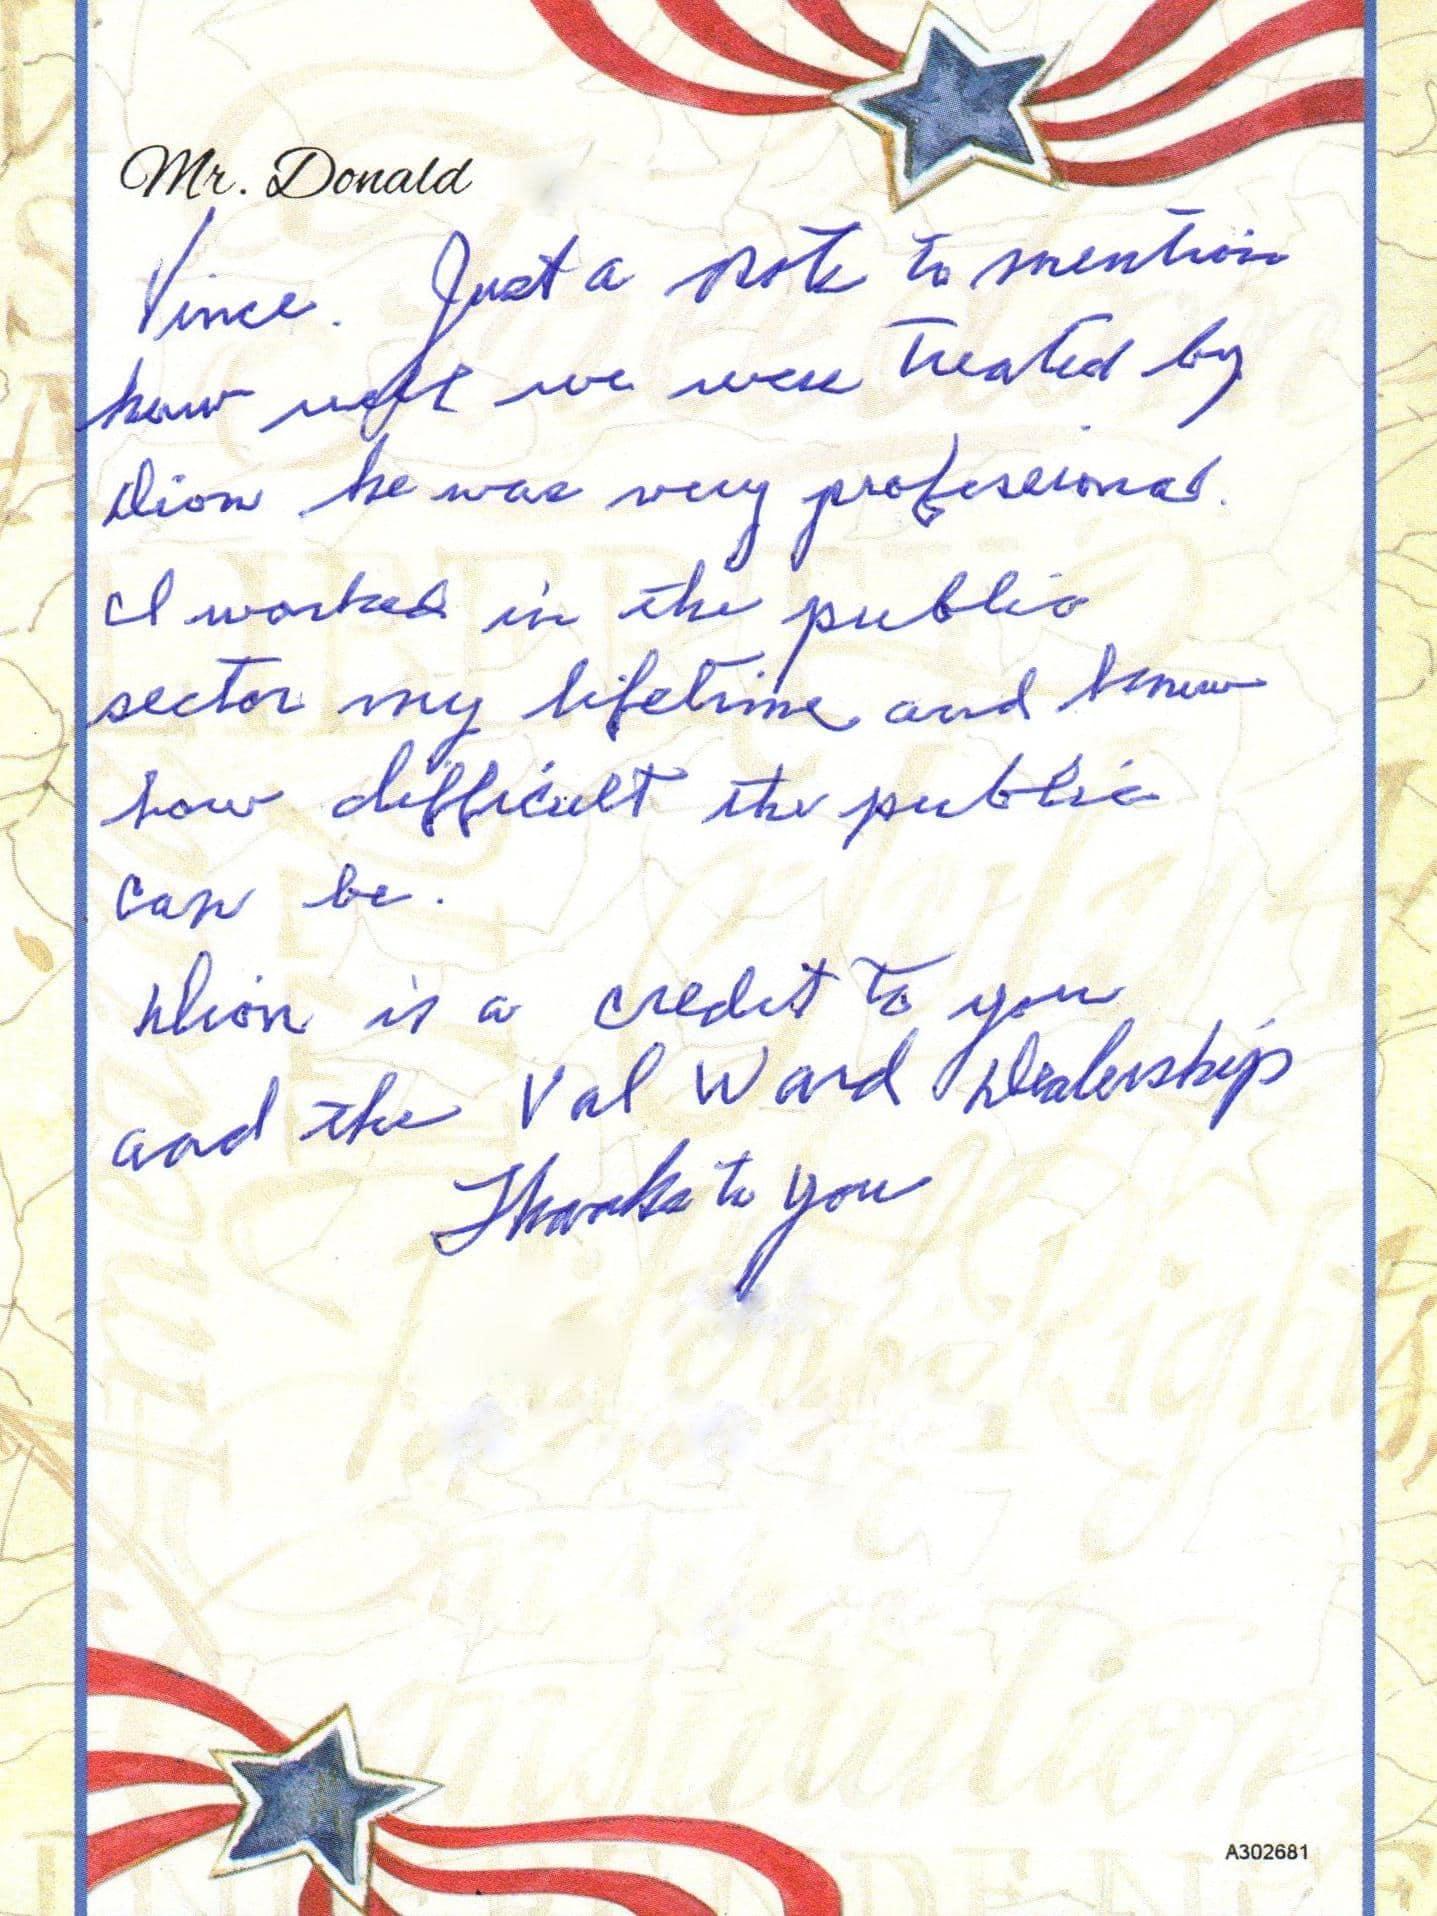 handwritten note on patriot notepaper